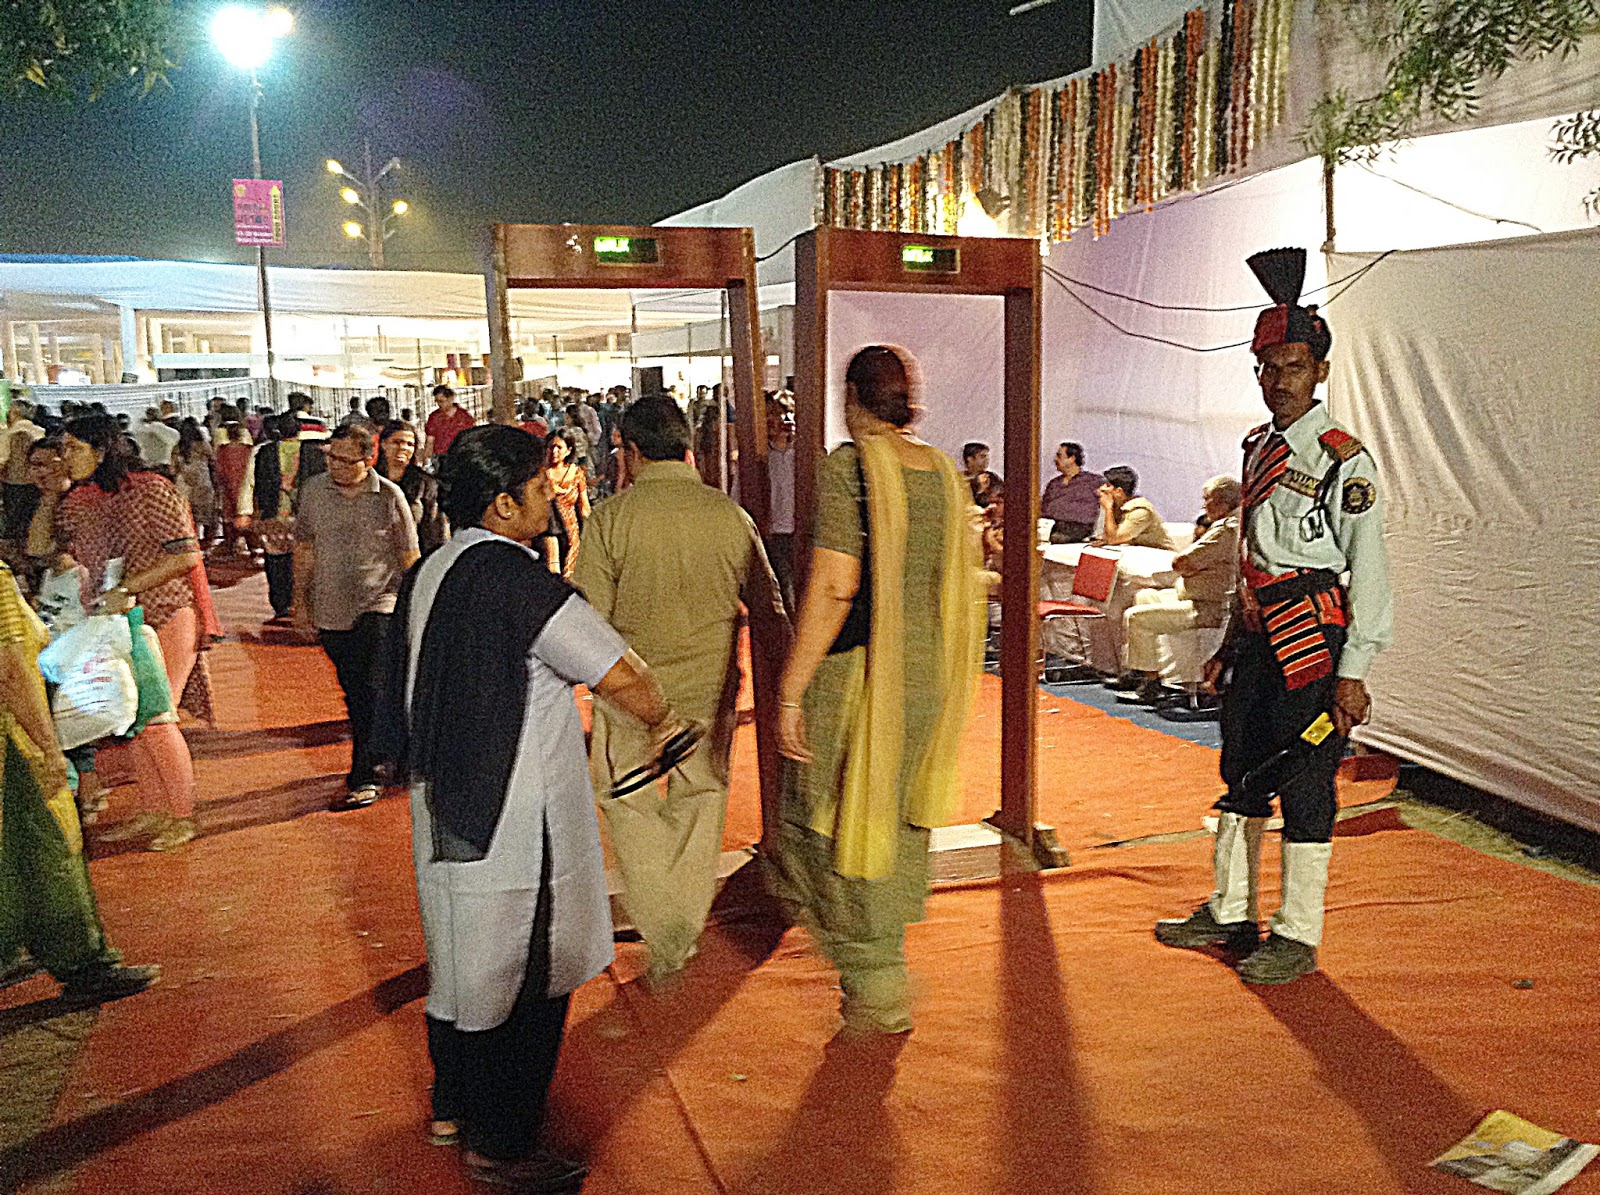 Security arrangements at the entrance for Deep Utsav, Noida